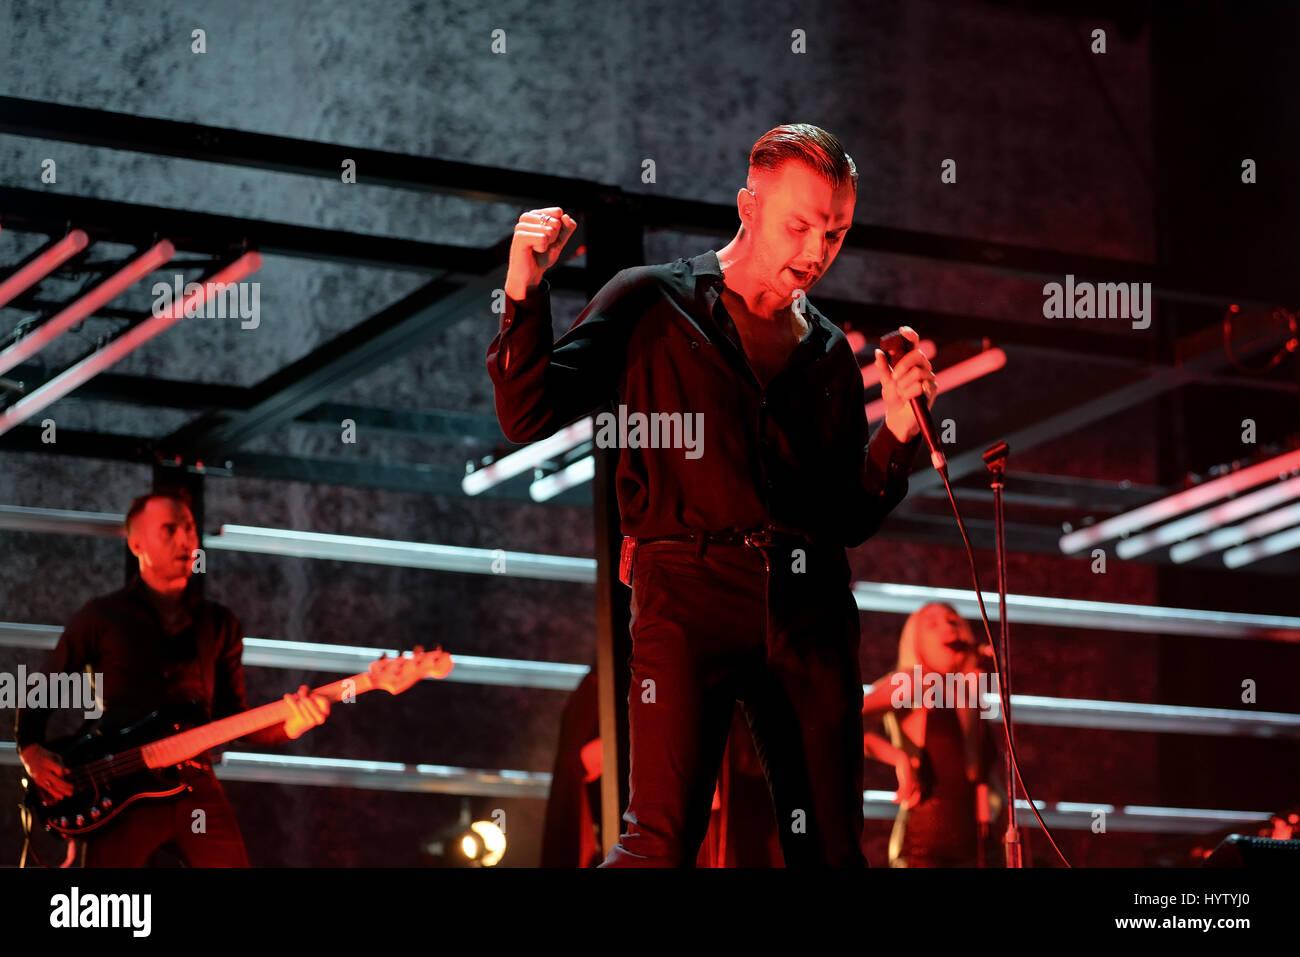 VALENCIA, Spanien - JUN 11: Hurts (Synthpop-Band) führen im Konzert beim Festival de Les Arts am 11. Juni 2016 in Stockfoto